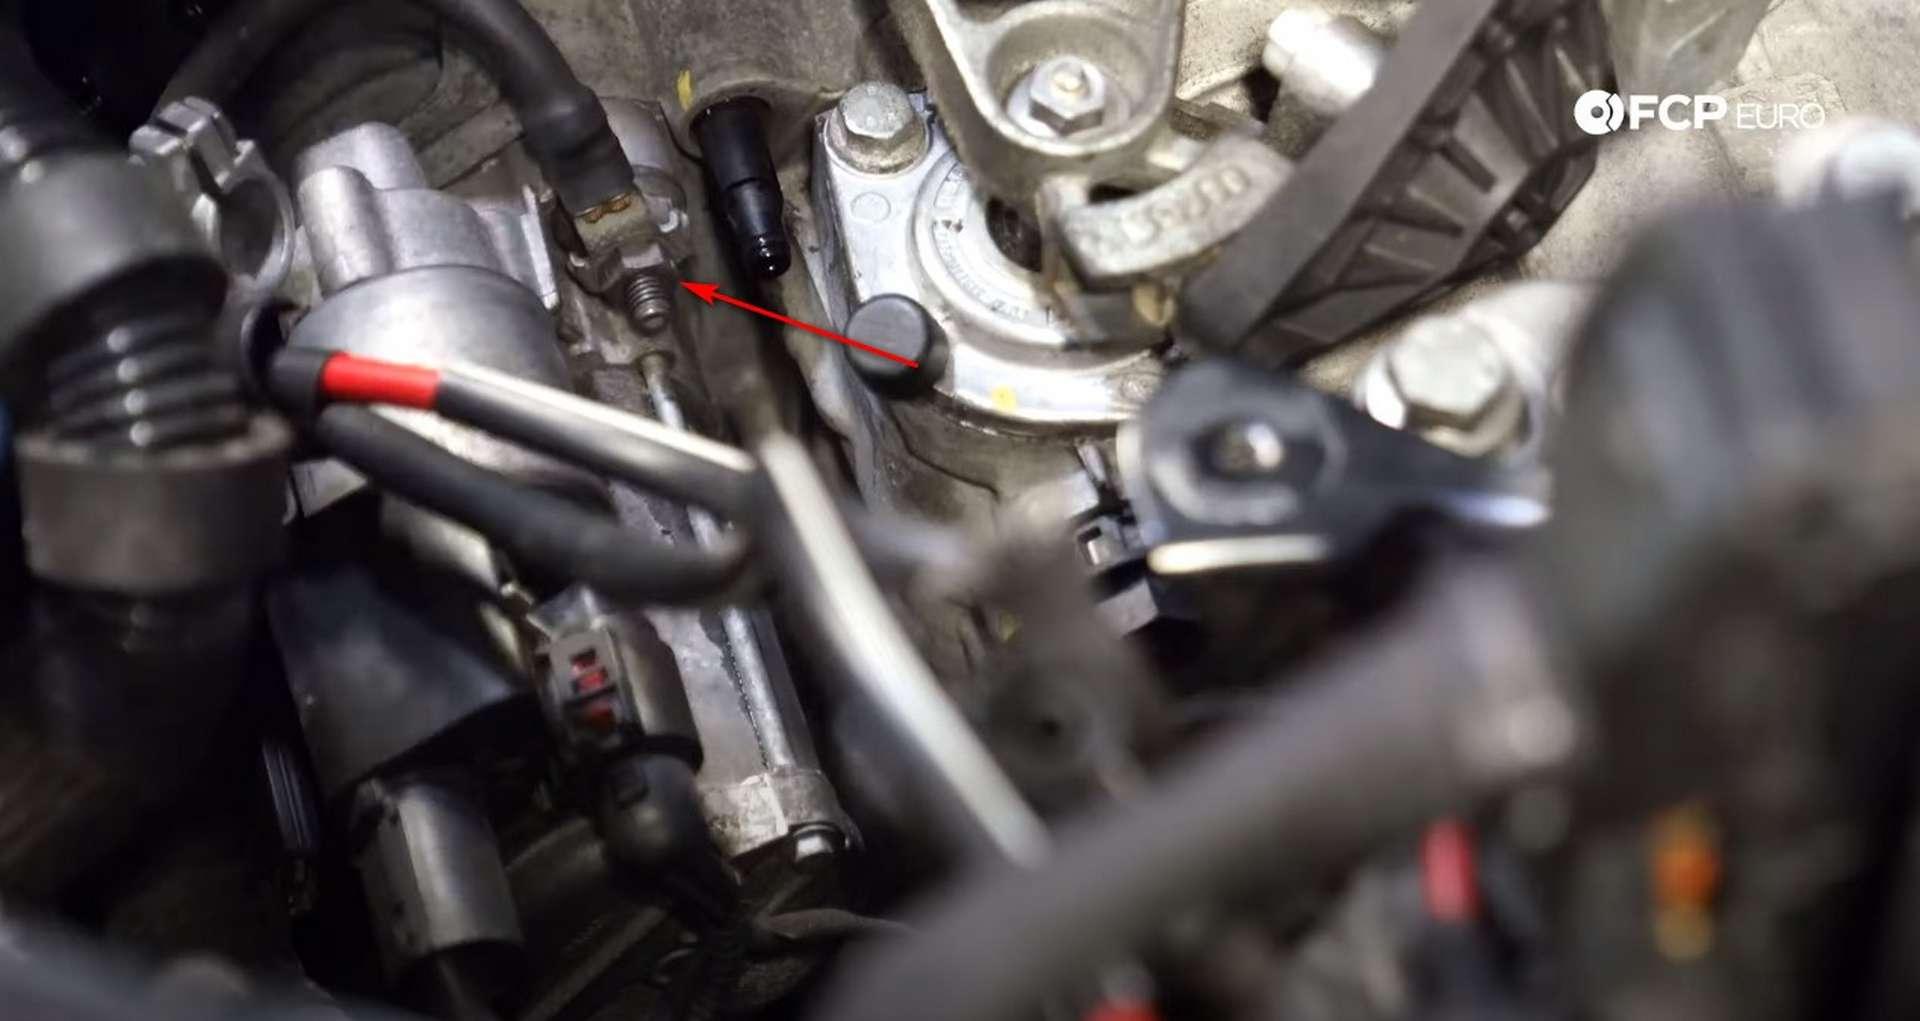 14-DIY_VW_GTI_Clutch-Job-Prepping-Topside-Transmission